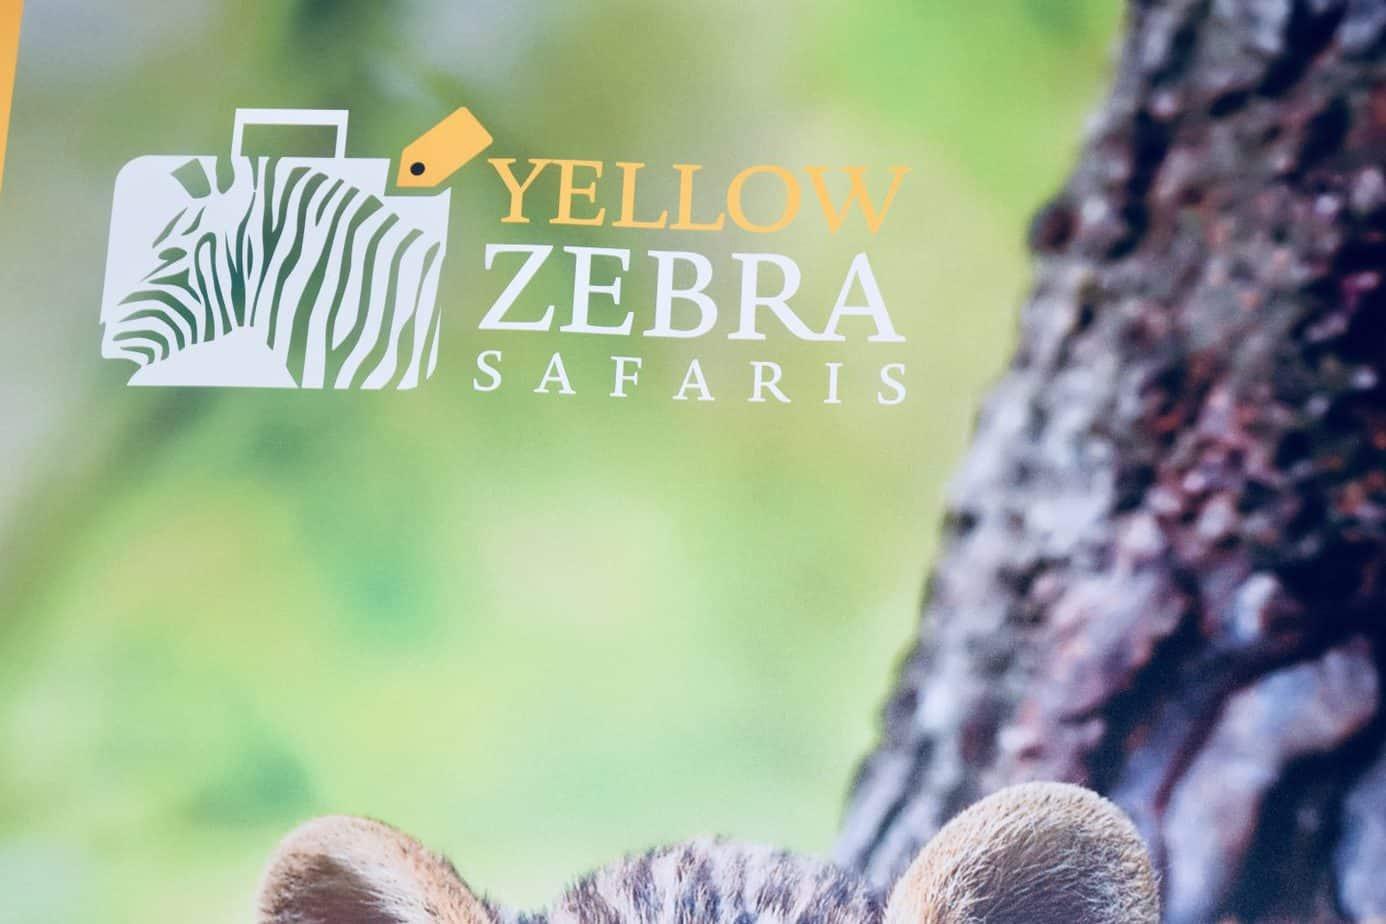 Yellow Zebra Safaris band logo